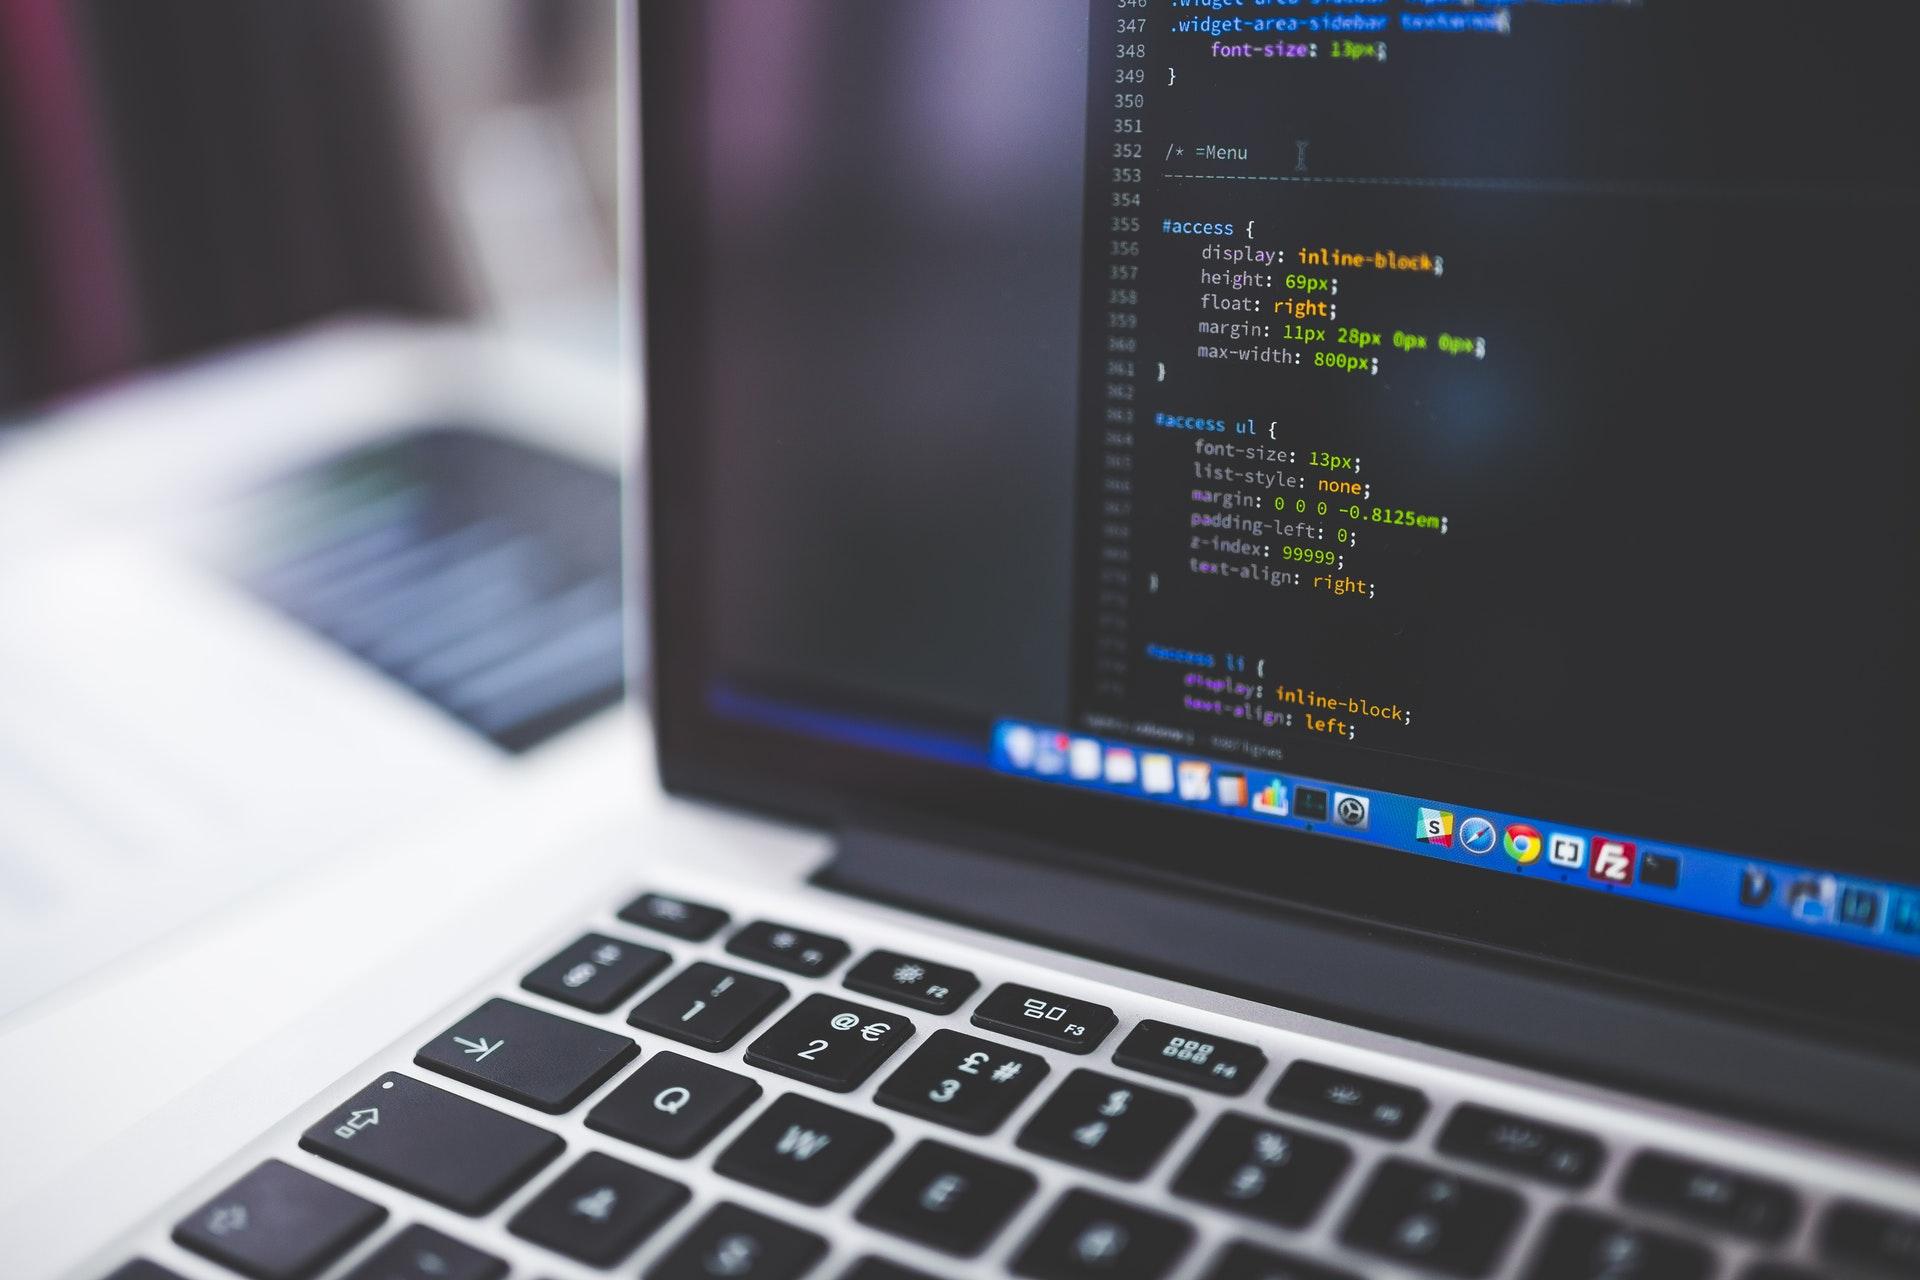 Fippi unveils its redesigned website